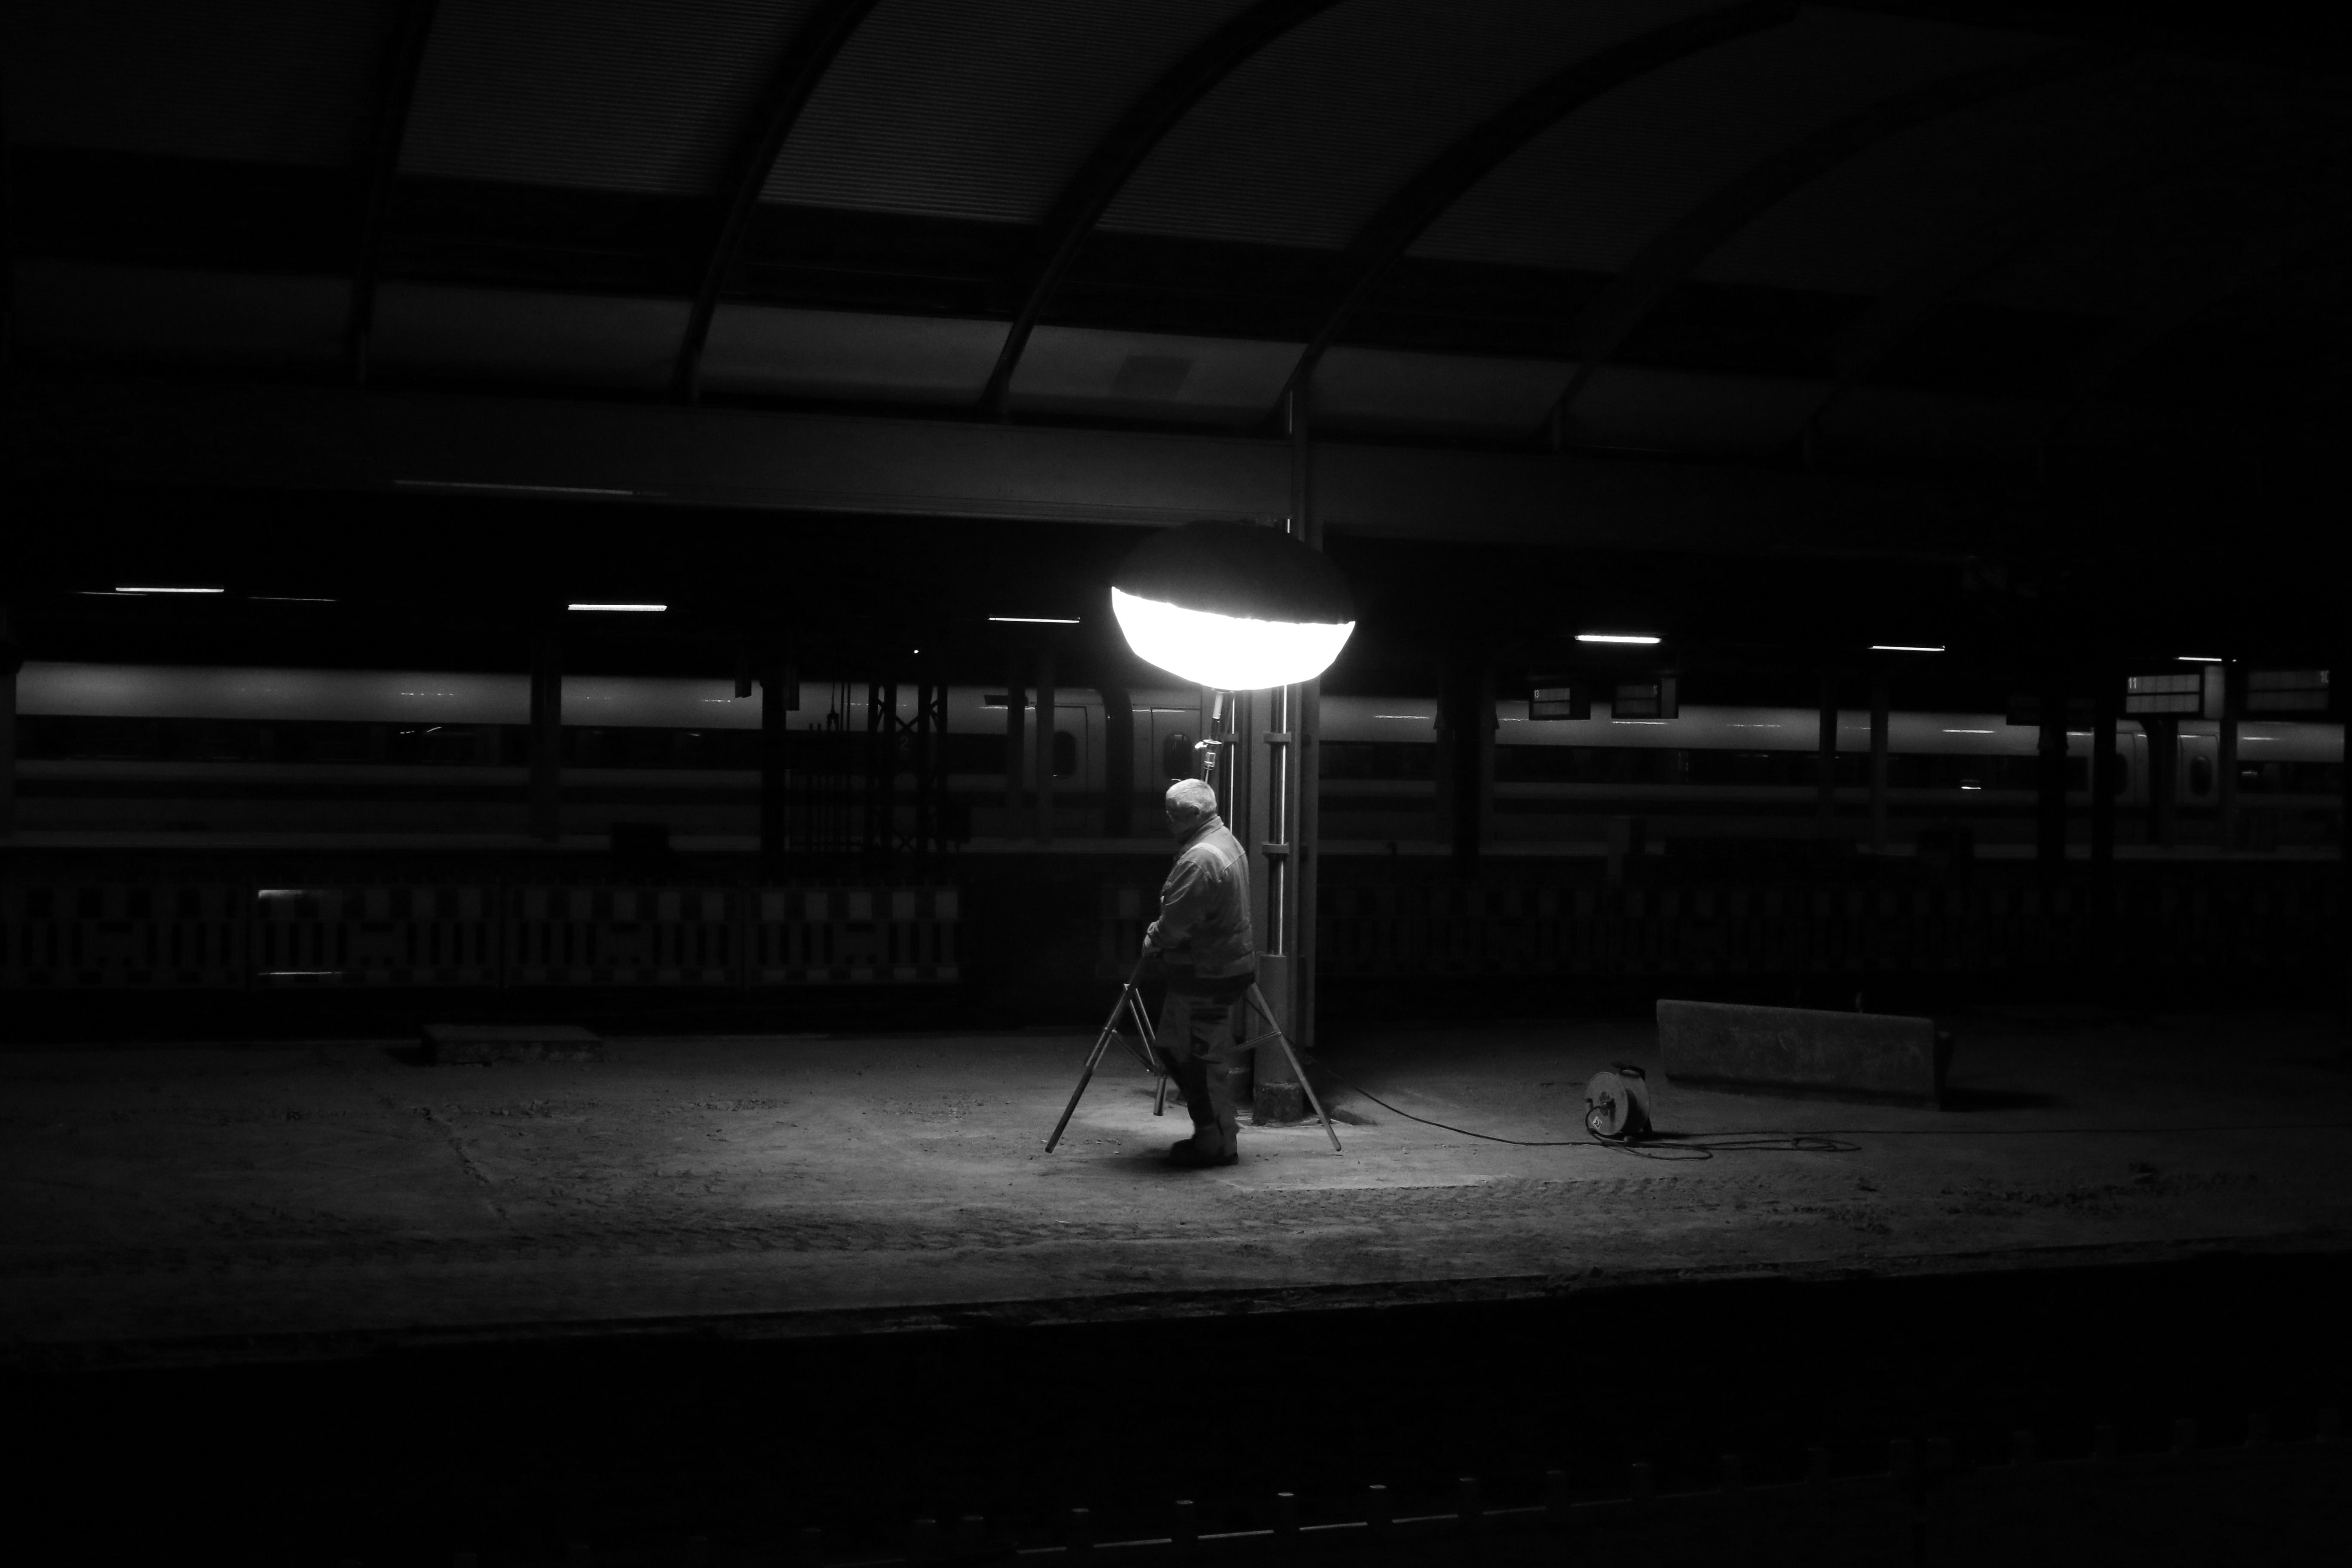 light-black-and-white-railway-white-night-photography-station-darkness-lamp-black-monochrome-lighting-bw-blackandwhite-blackwhite-worker-germany-alemania-allemagne-sw-schwarzweiss-bahnhof-schwarzweis-railwaystation-shape-midnight-frankfurtmain-frankfurtammain-germania-lampe-frankfurt-schwarzweissfotografie-hauptbahnhof-schwarzweisfotografie-centralstation-arbeiter-mainstation-frankfurthauptbahnhof-mitternacht-monochrome-photography-film-noir-240993 Spannende Lampen Frankfurt Am Main Dekorationen